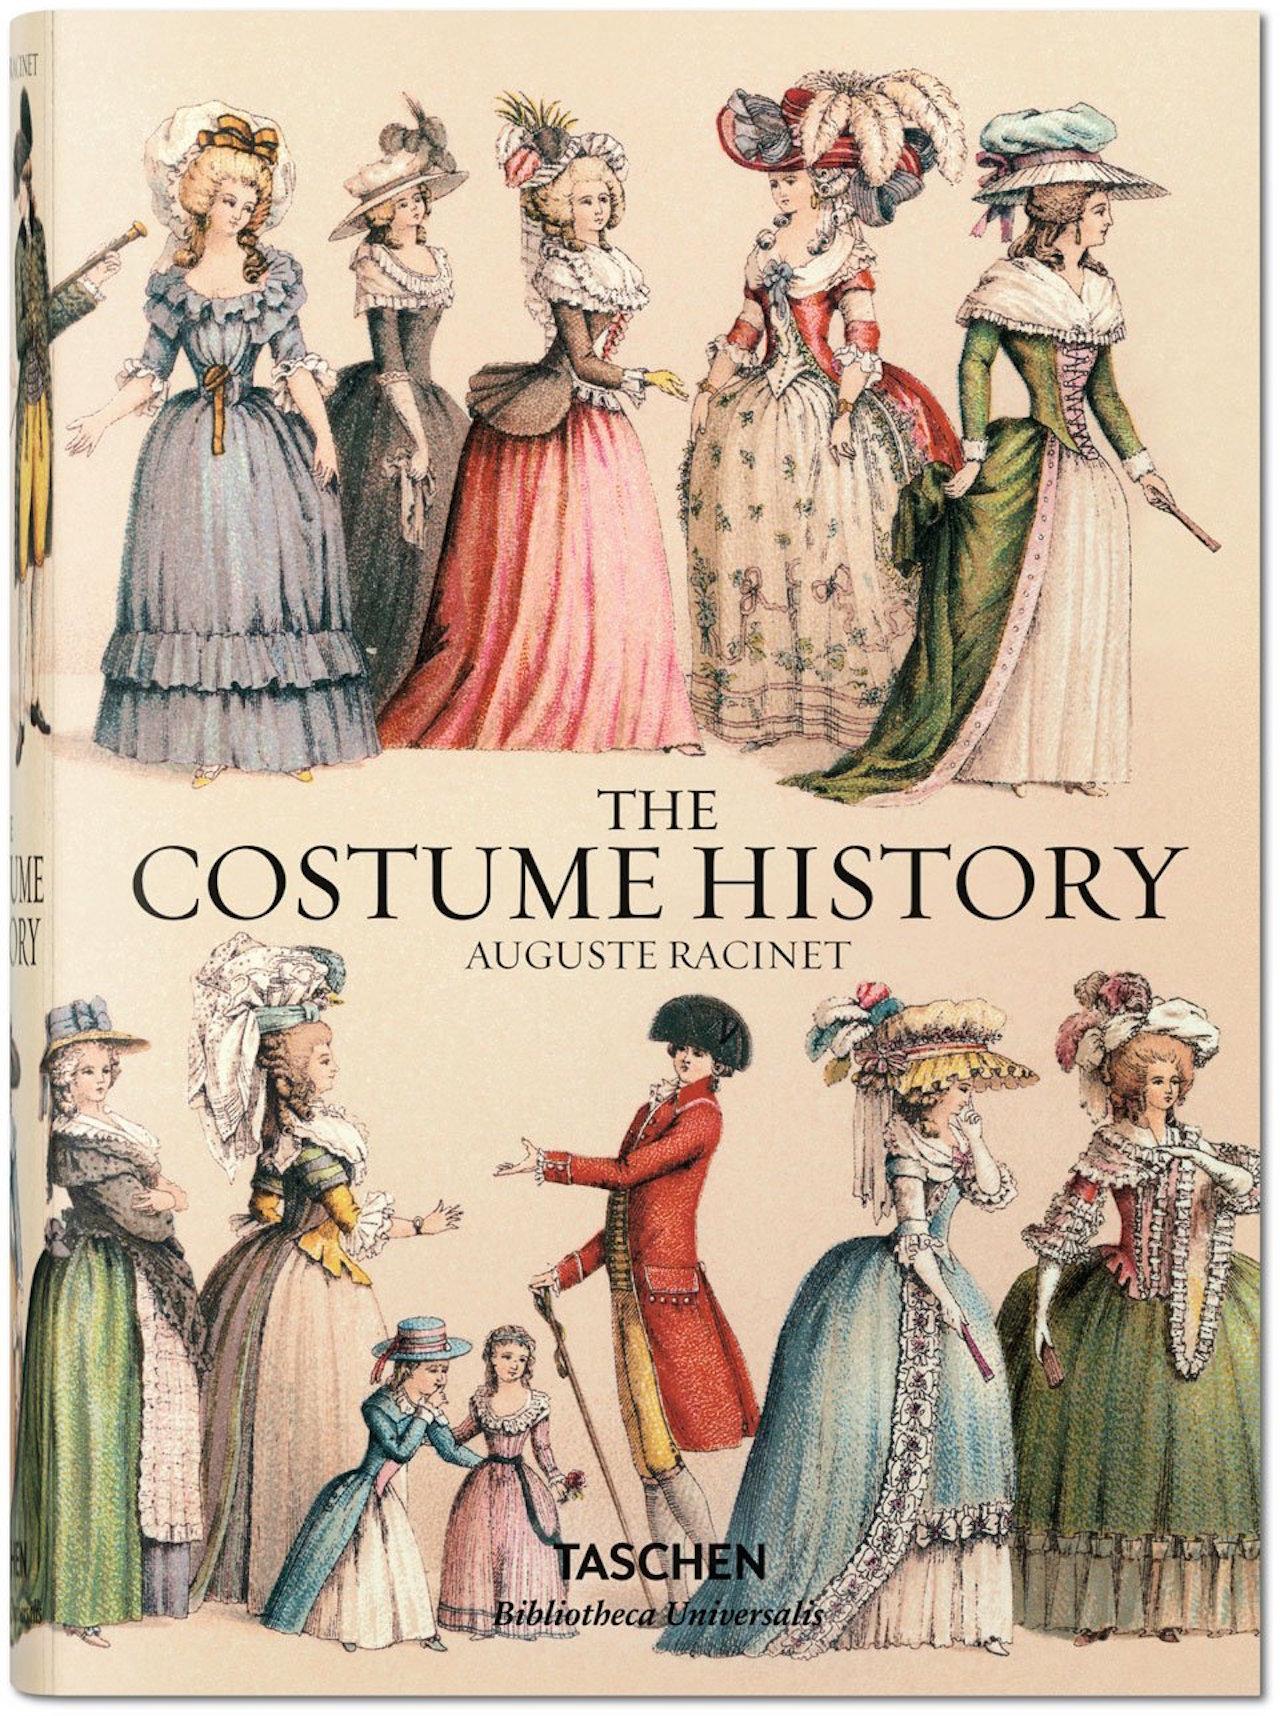 racinet_costume_history_hc_bu_gb_3d_05425_1508101446_id_987175